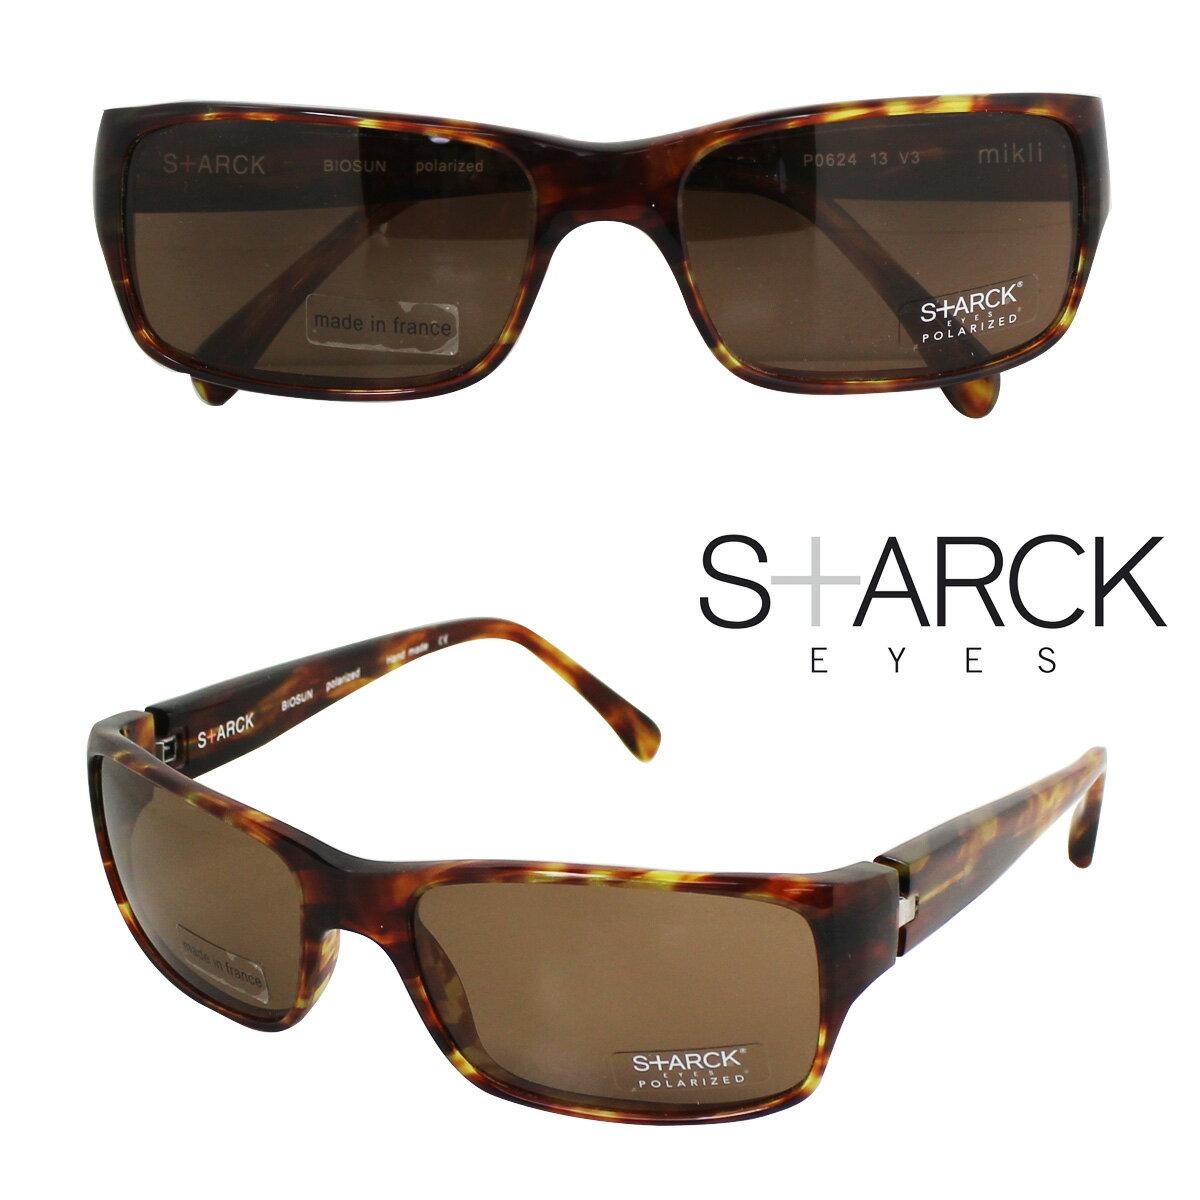 STARCK EYES スタルクアイズ alain mikli アランミクリ サングラス メガネ 眼鏡 フランス製 メンズ レディース